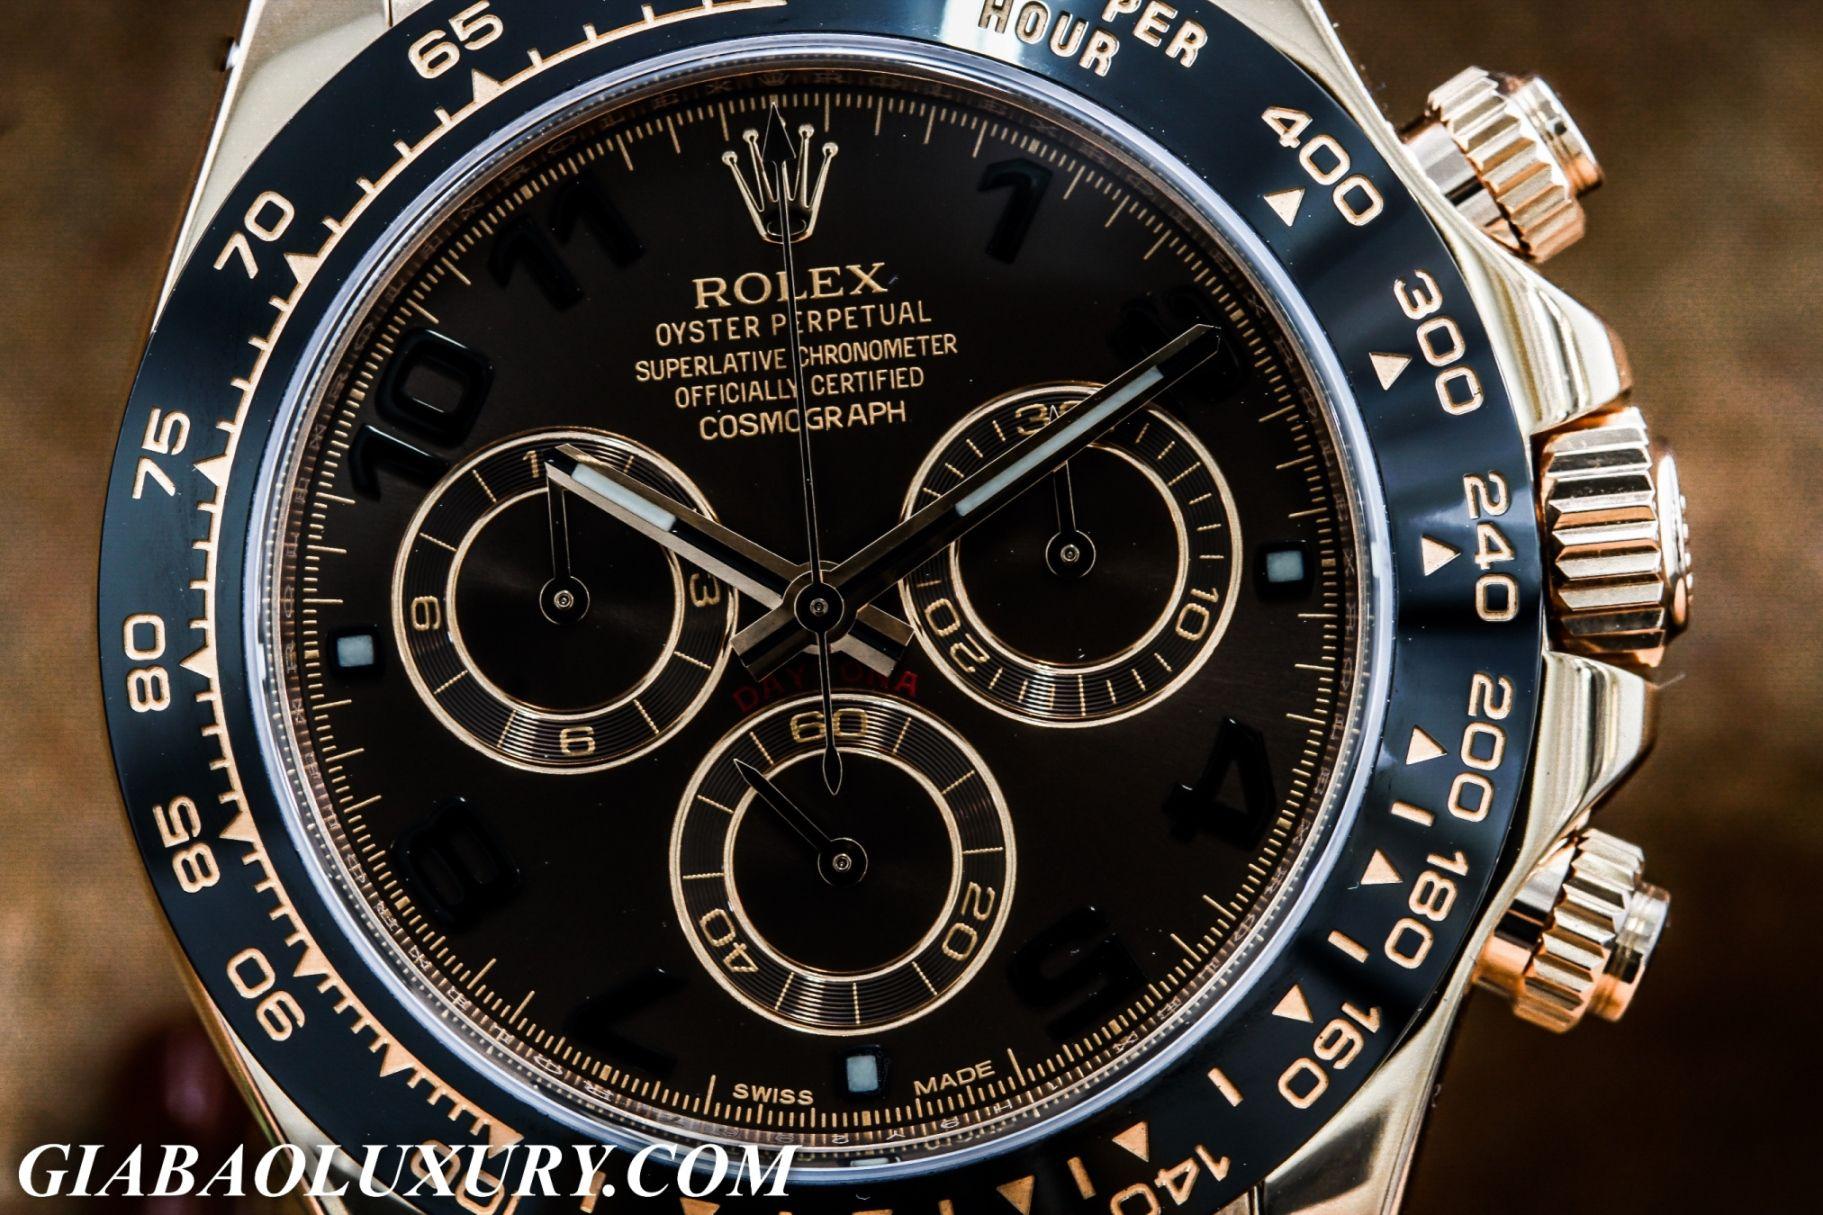 Mặt đồng hồ Rolex Cosmograph Daytona 116515